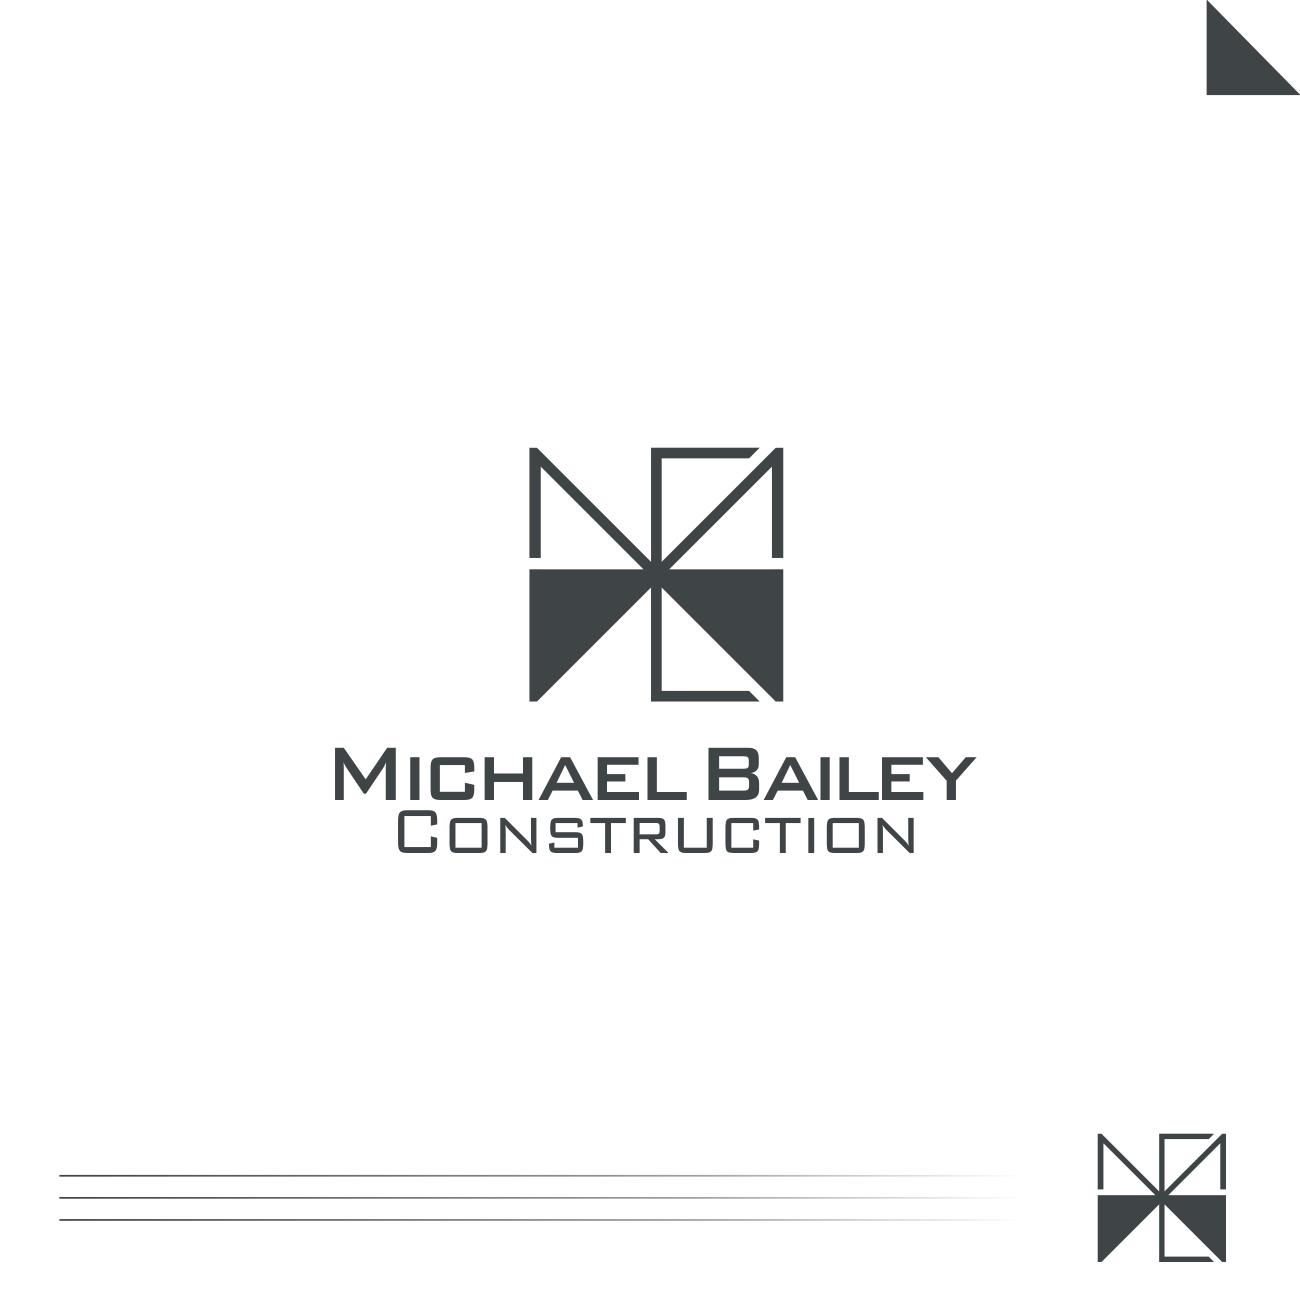 bold, serious, construction company logo design for michael bailey